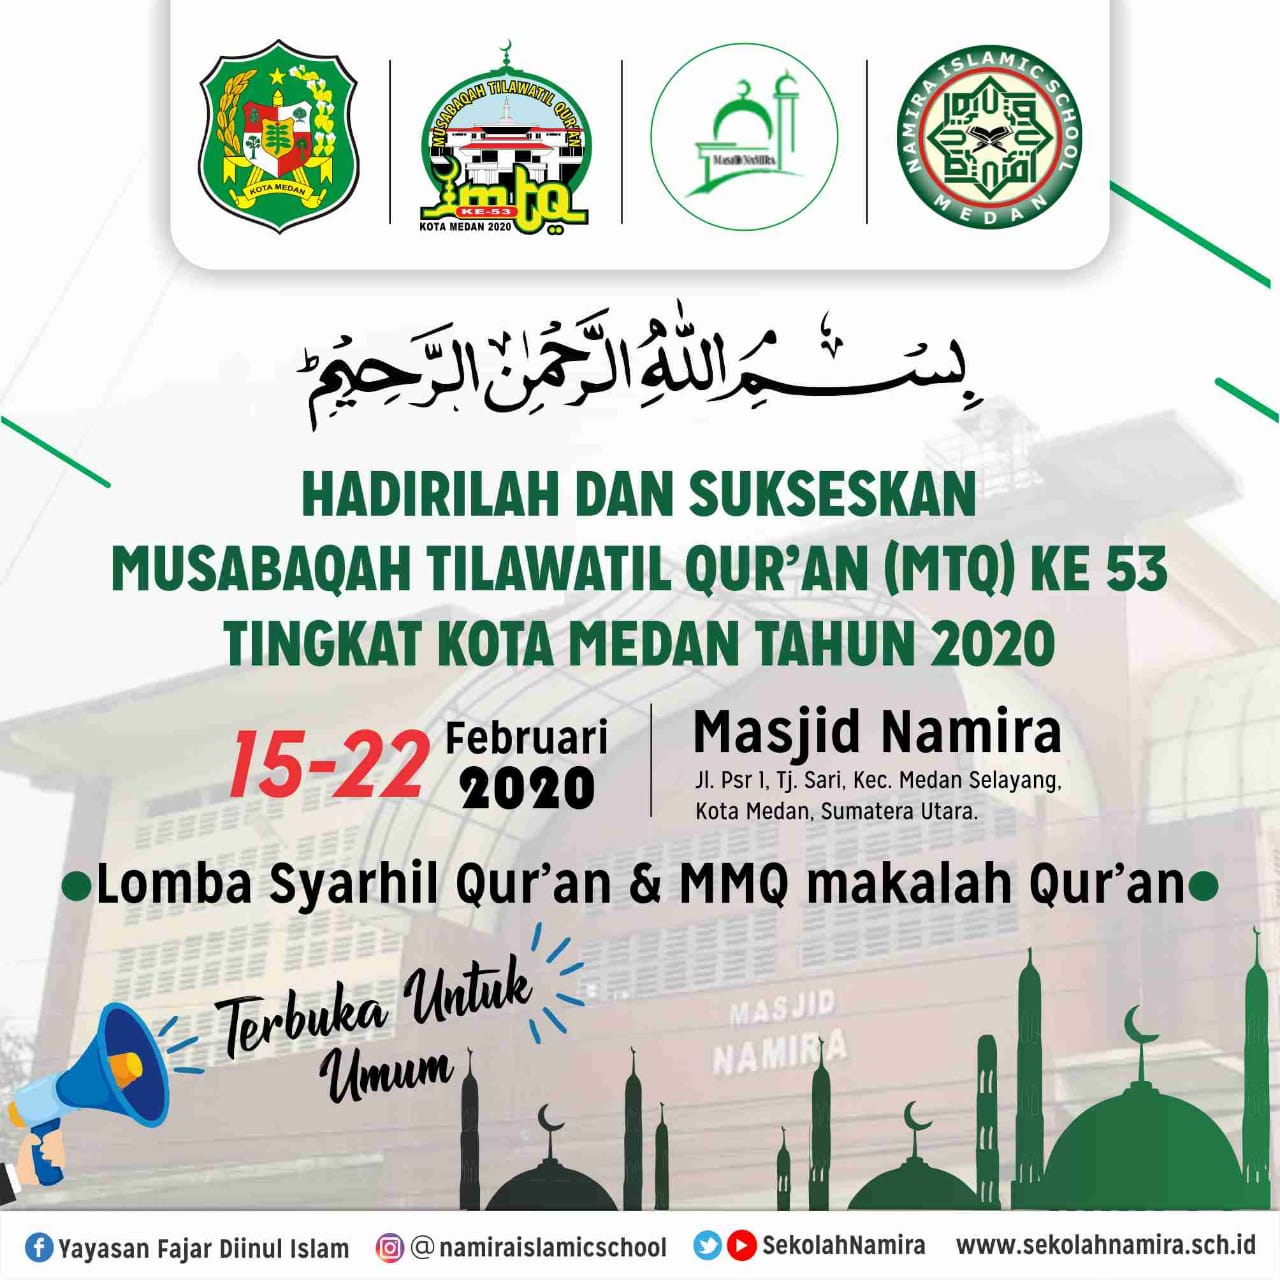 Alhamdulillah Sekolah Namira Menjadi Tempat Pelaksanaan Perlombaan Syarhil Quran dan MMQ pada MTQ Ke 53 Kota Medan